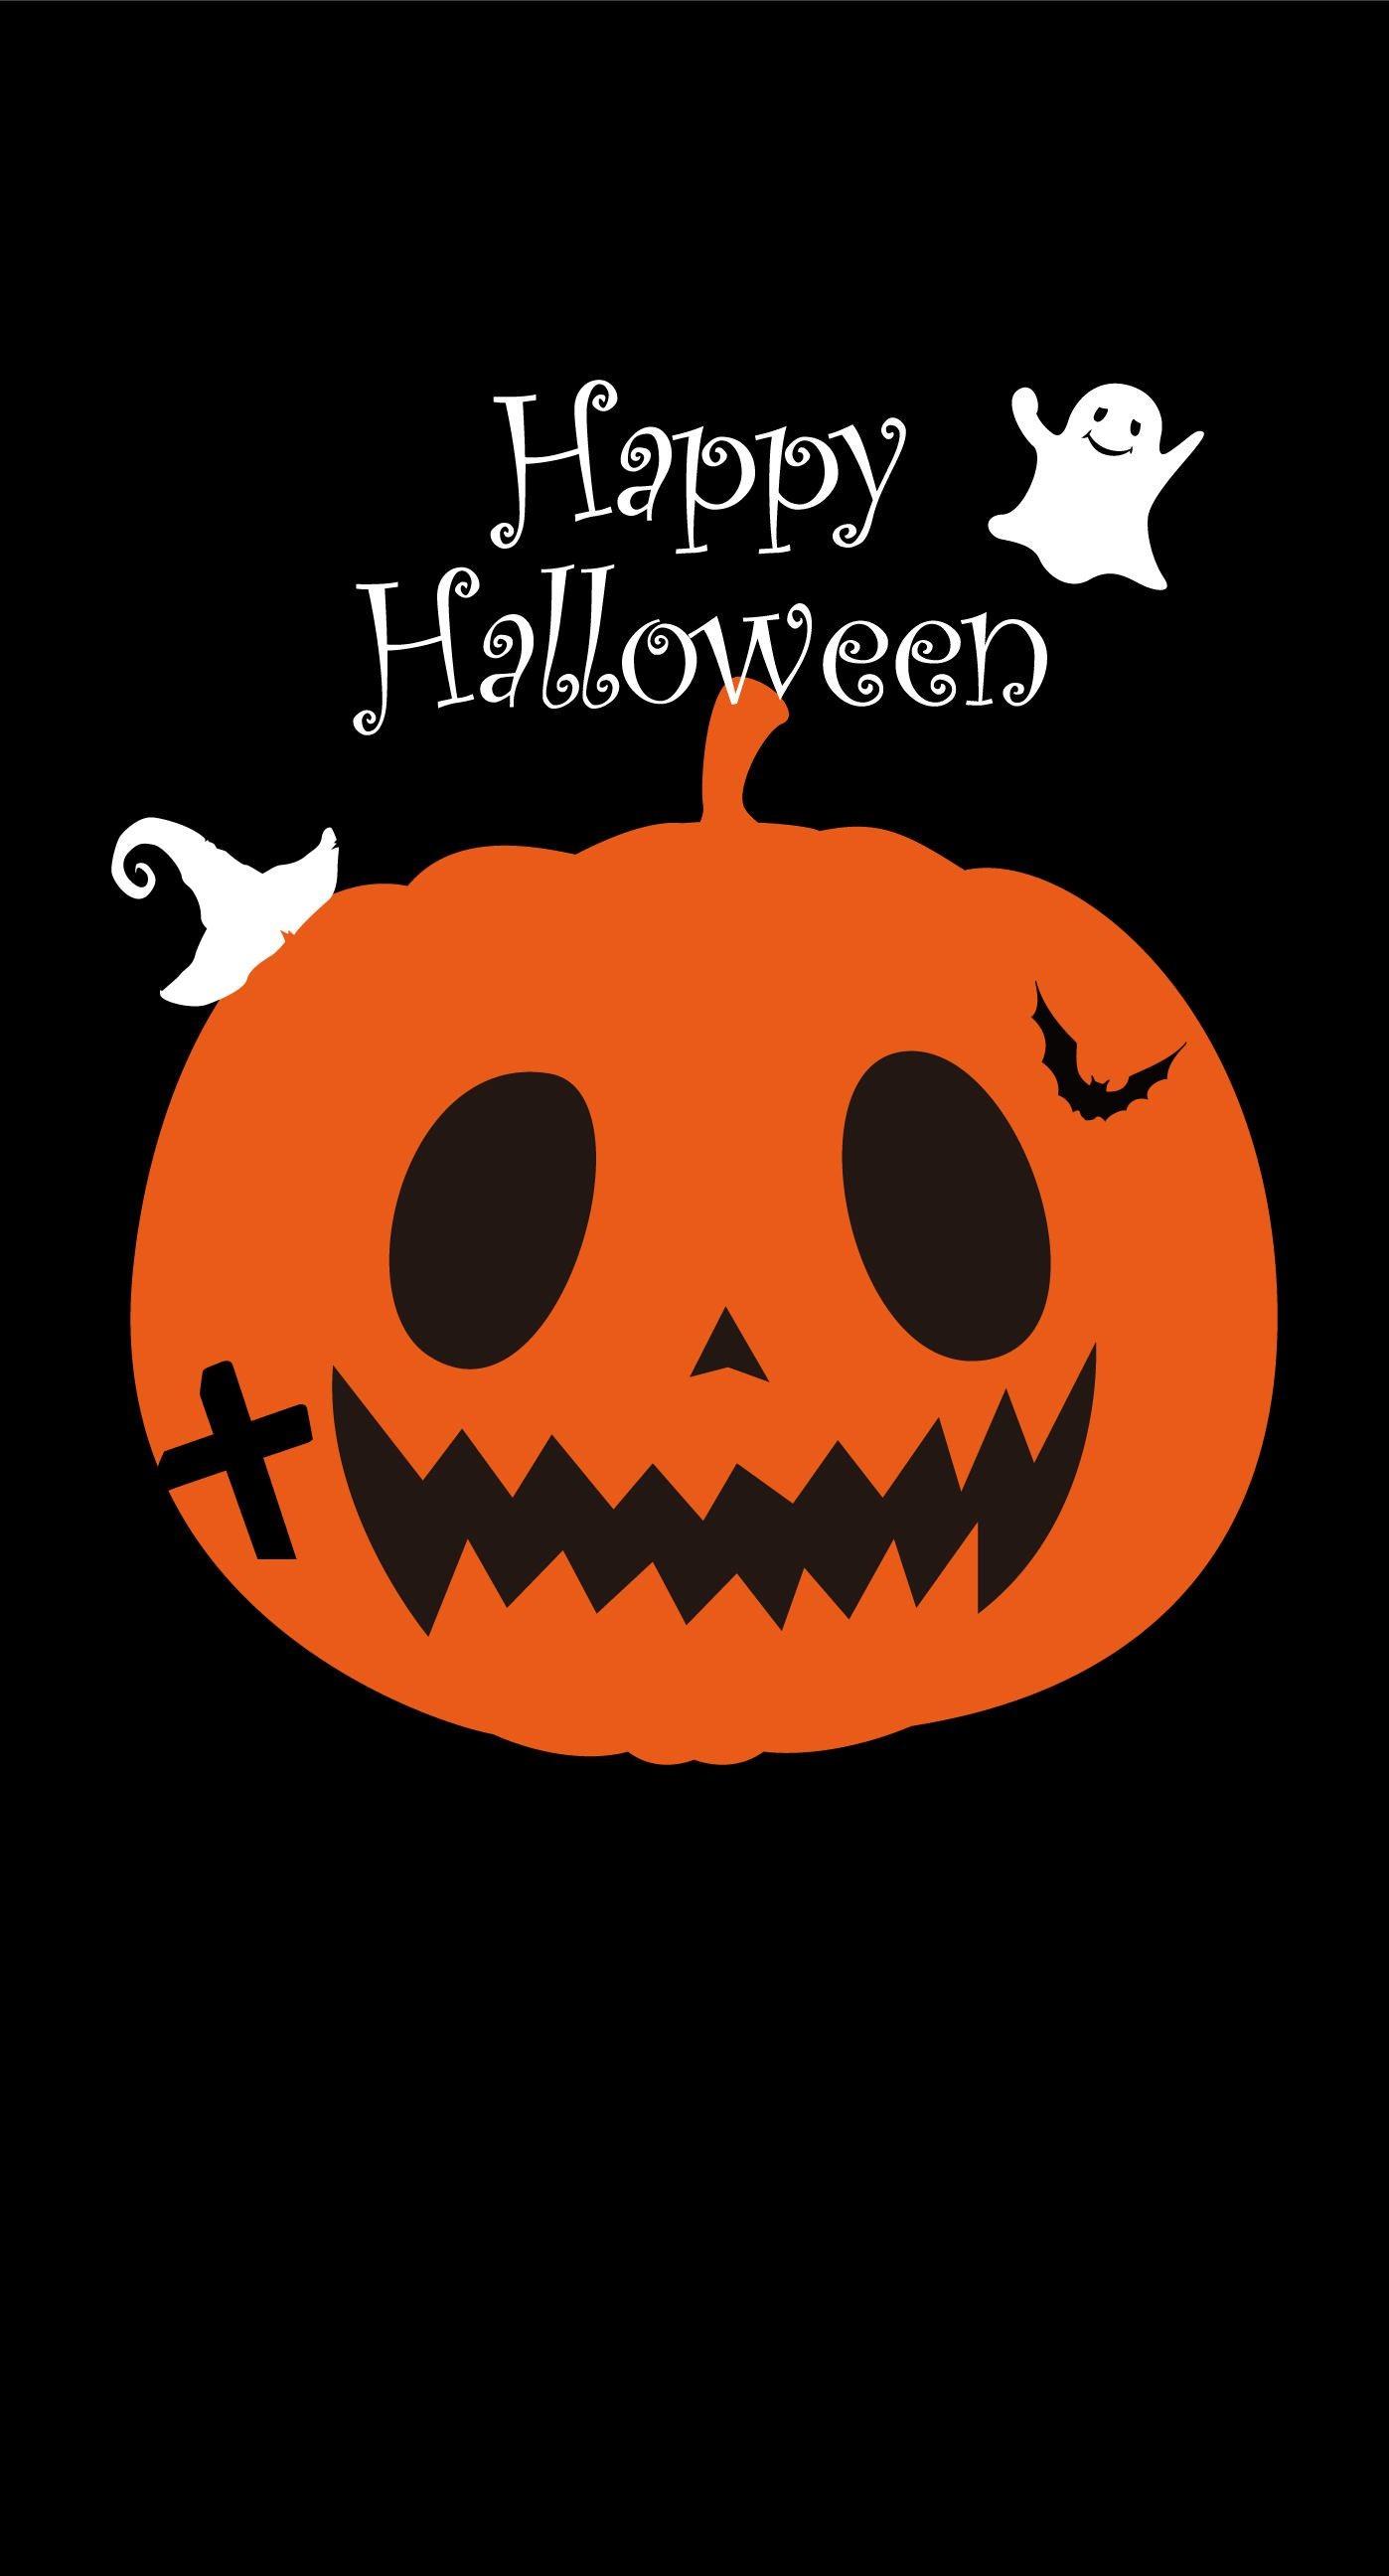 Halloween Pumpkin Wallpaper Iphone.Great Pumpkin Wallpaper 60 Images